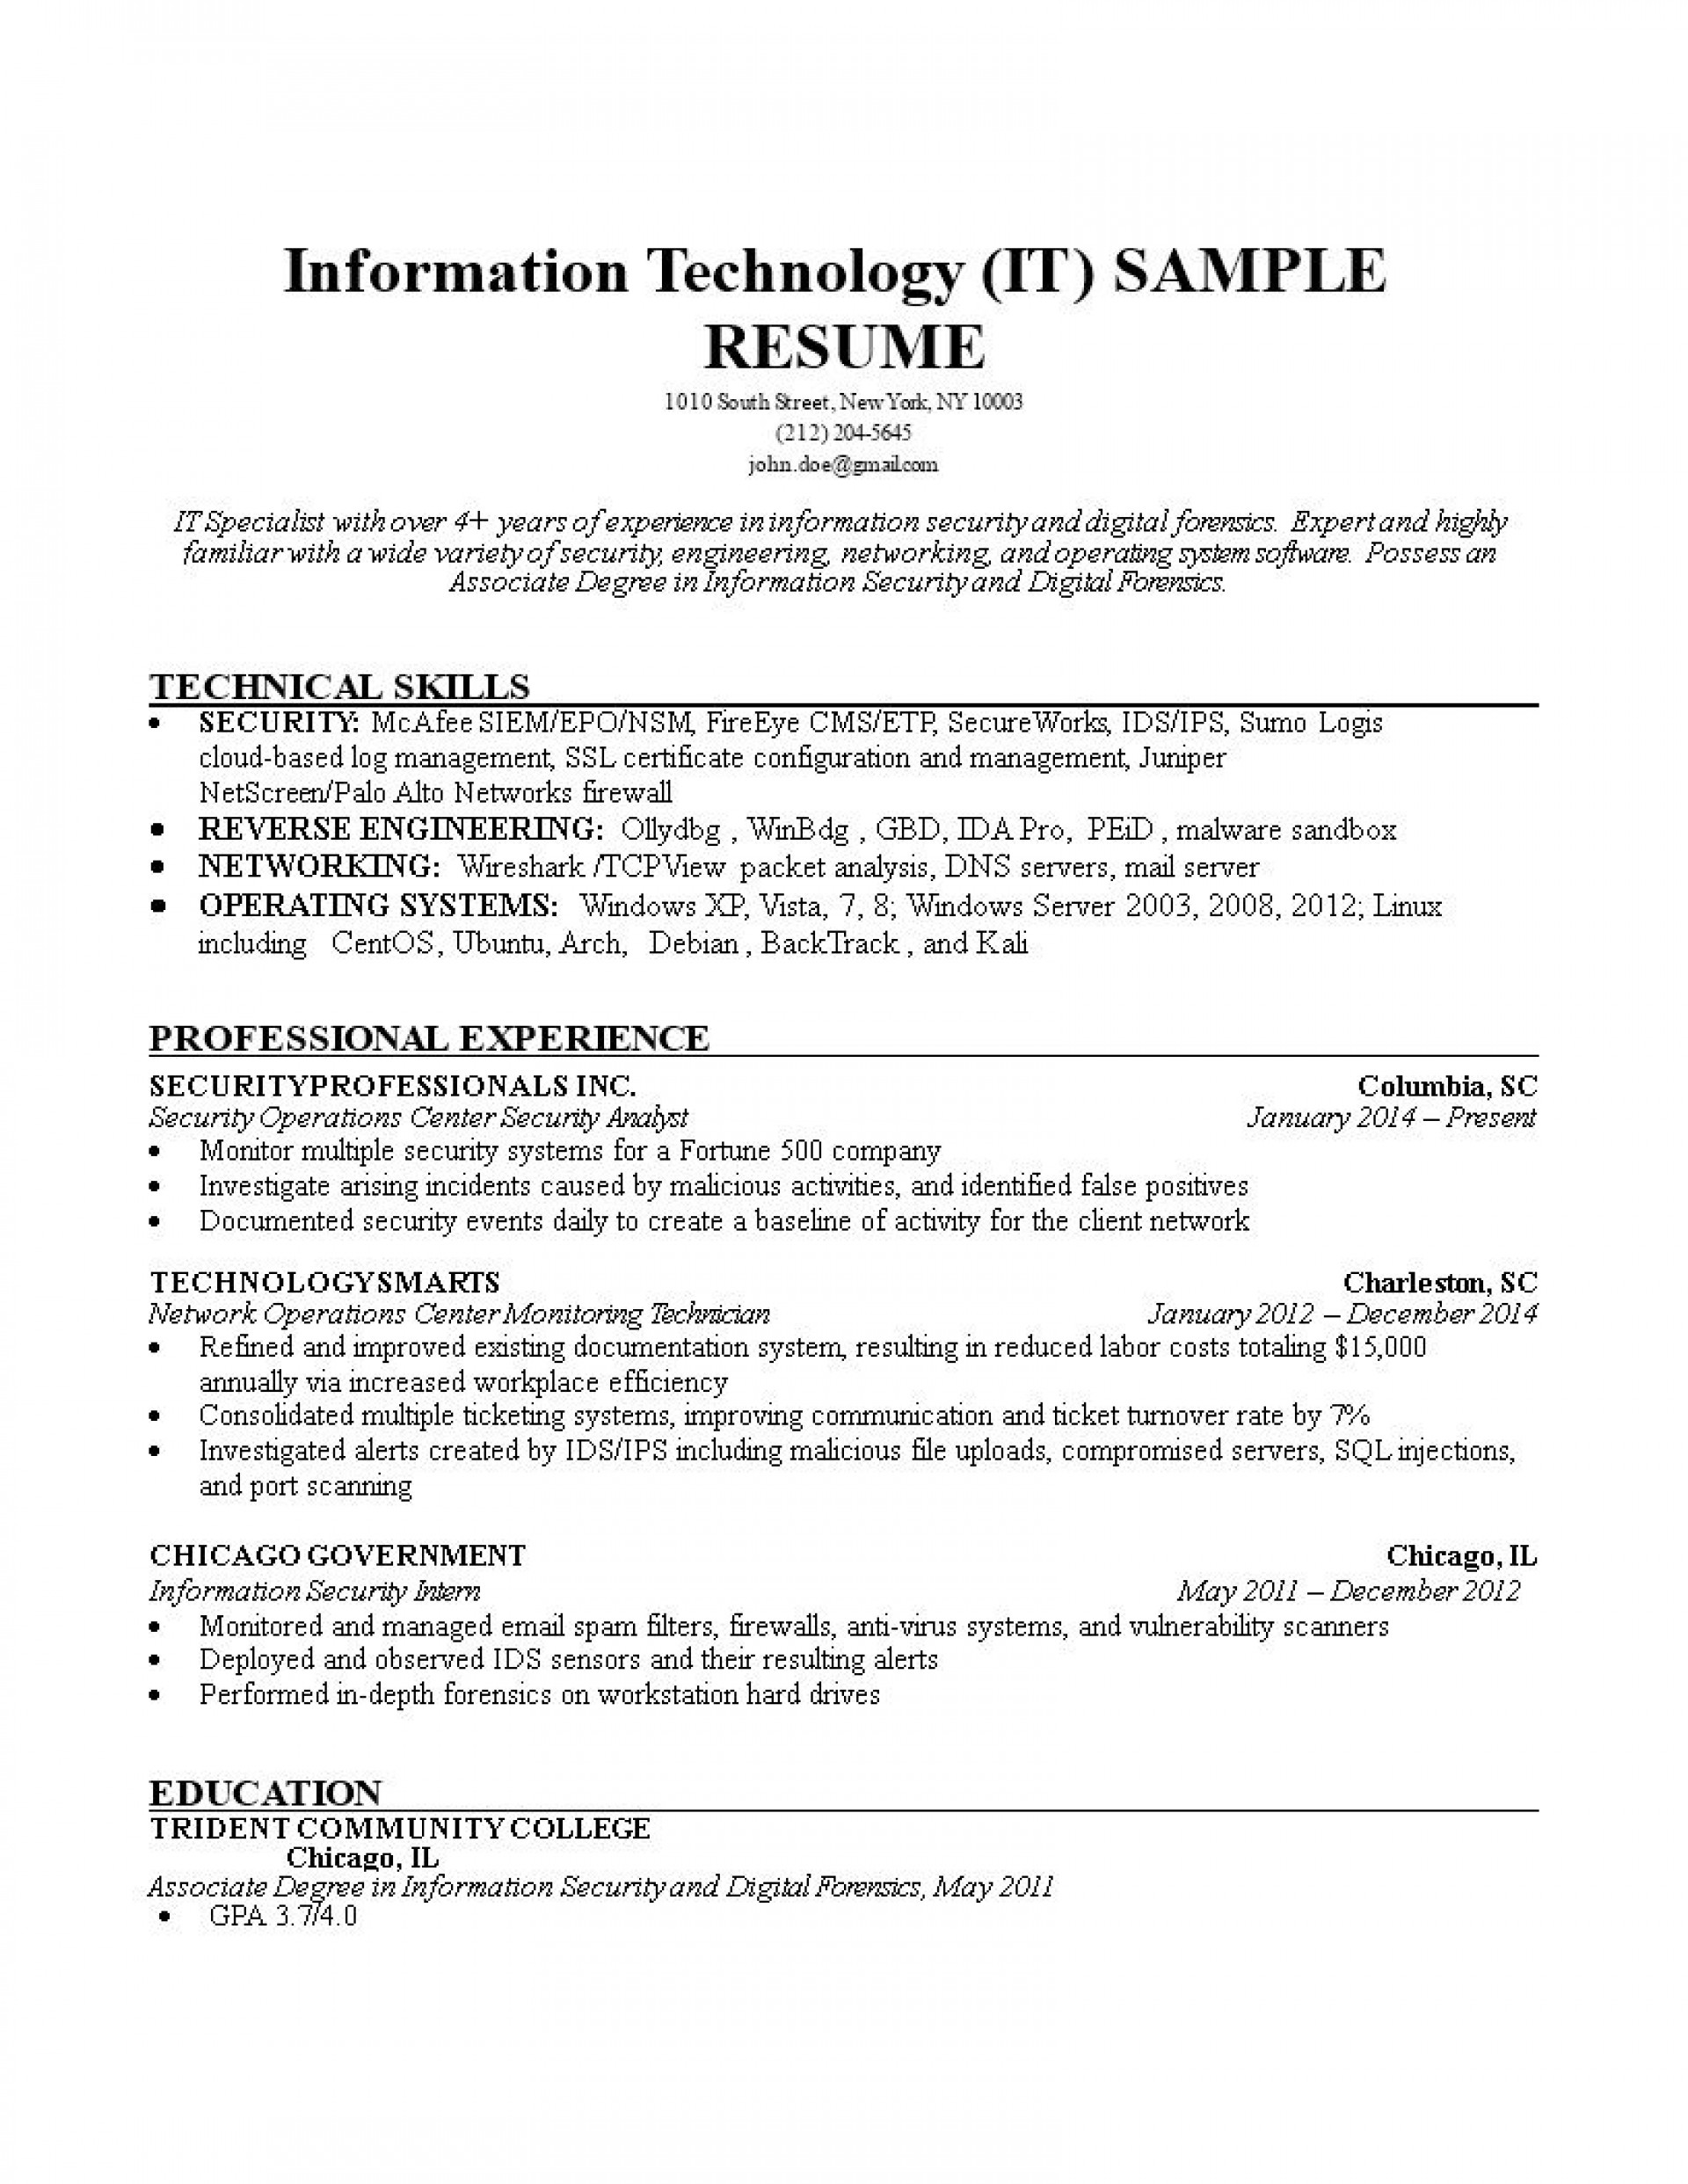 001 Sensational Information Technology Resume Template Design  Specialist Free Best1920